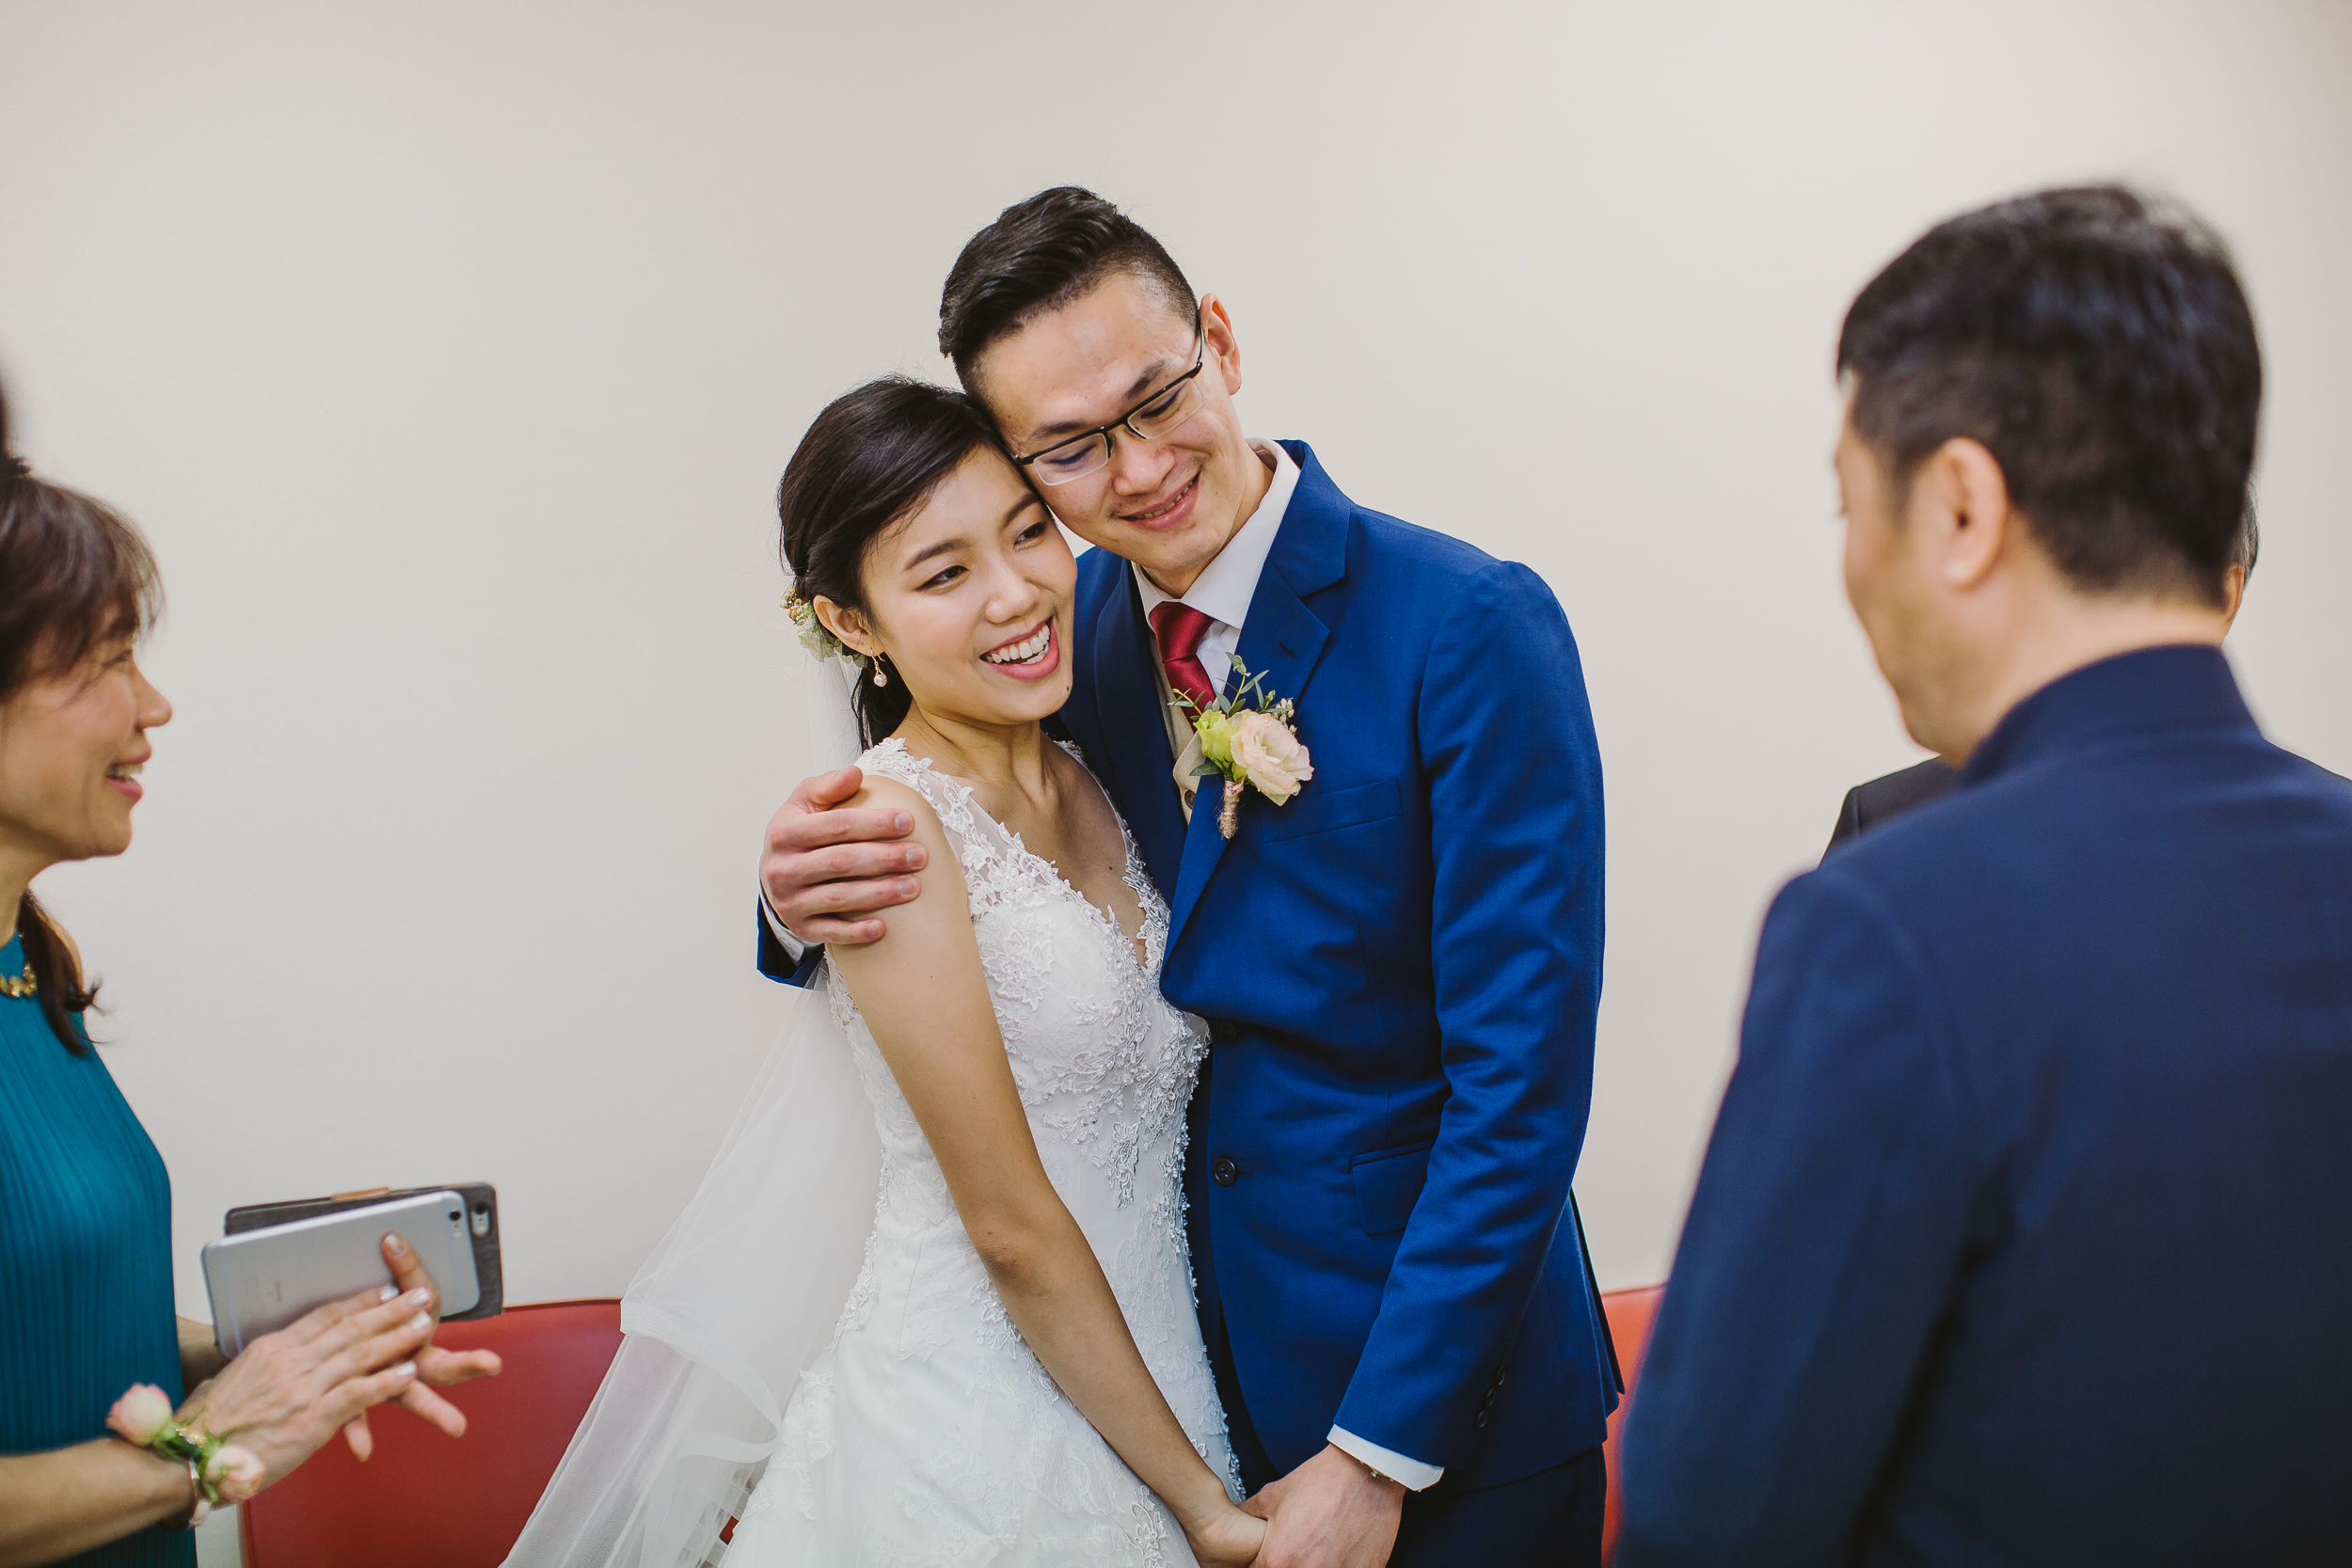 Singapore+Actual+Day+Wedding+Photographer+Min+Jiang+Rochester+Gareth+Faith--0021.jpg